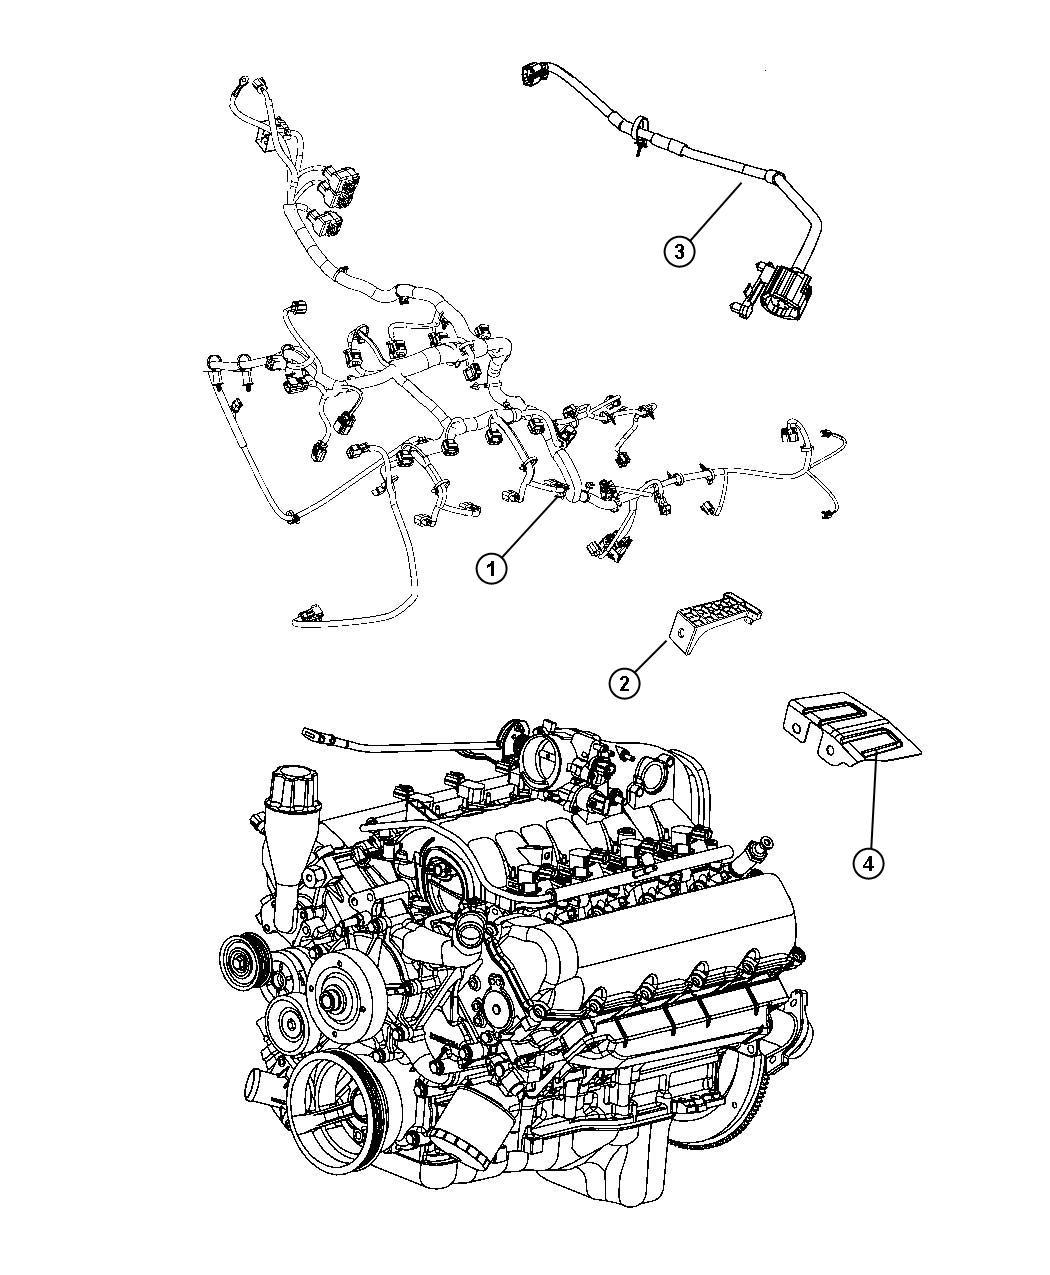 Dodge Ram 2500 Wiring. Jumper. Variable timing solenoid